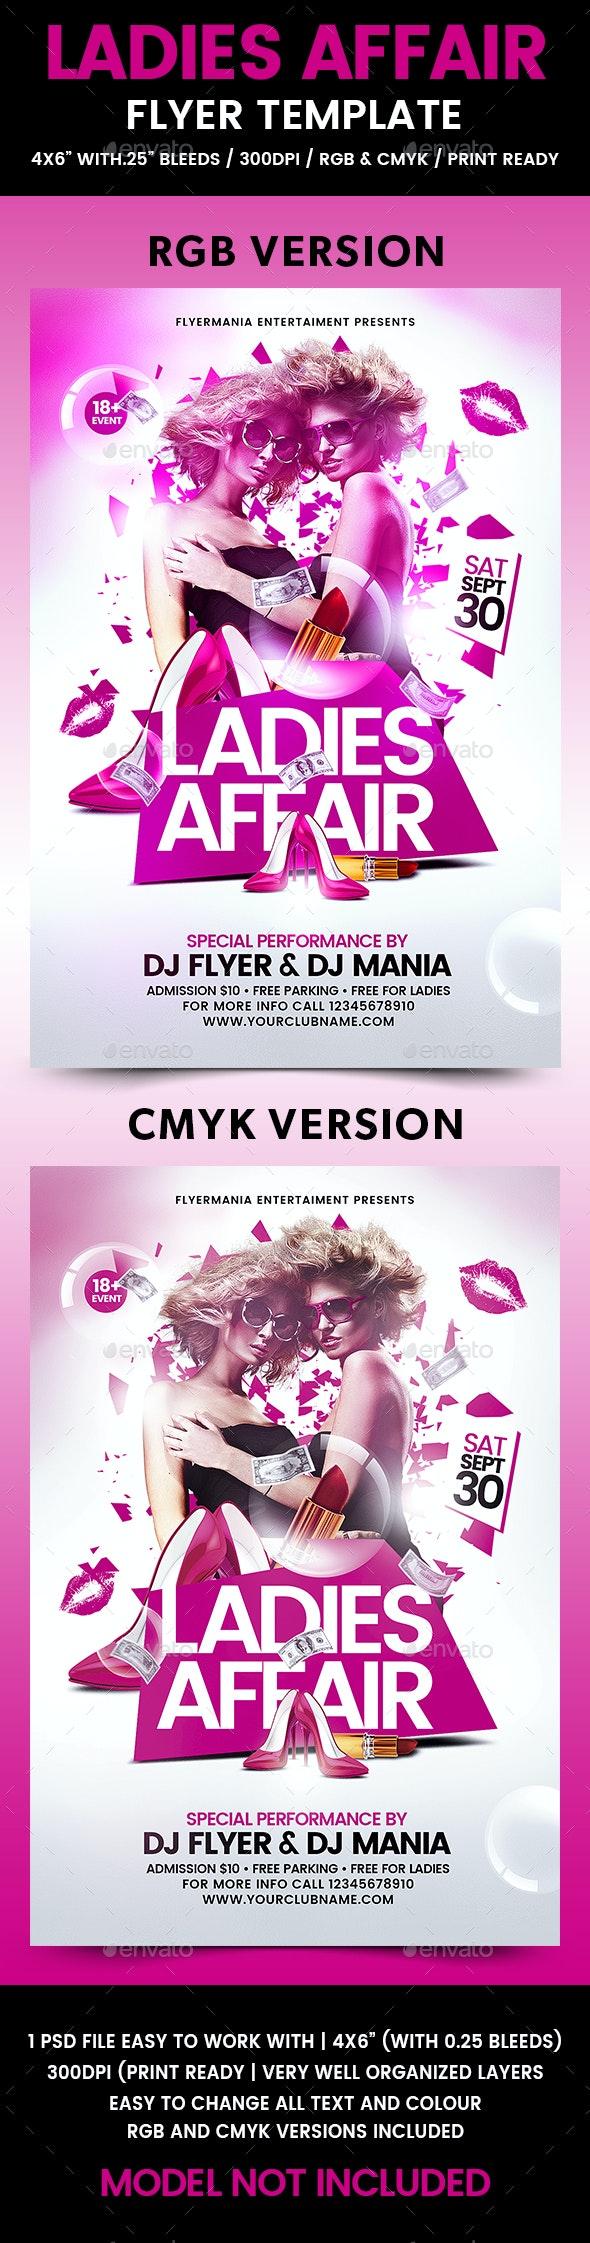 Ladies Affair Flyer Template - Flyers Print Templates